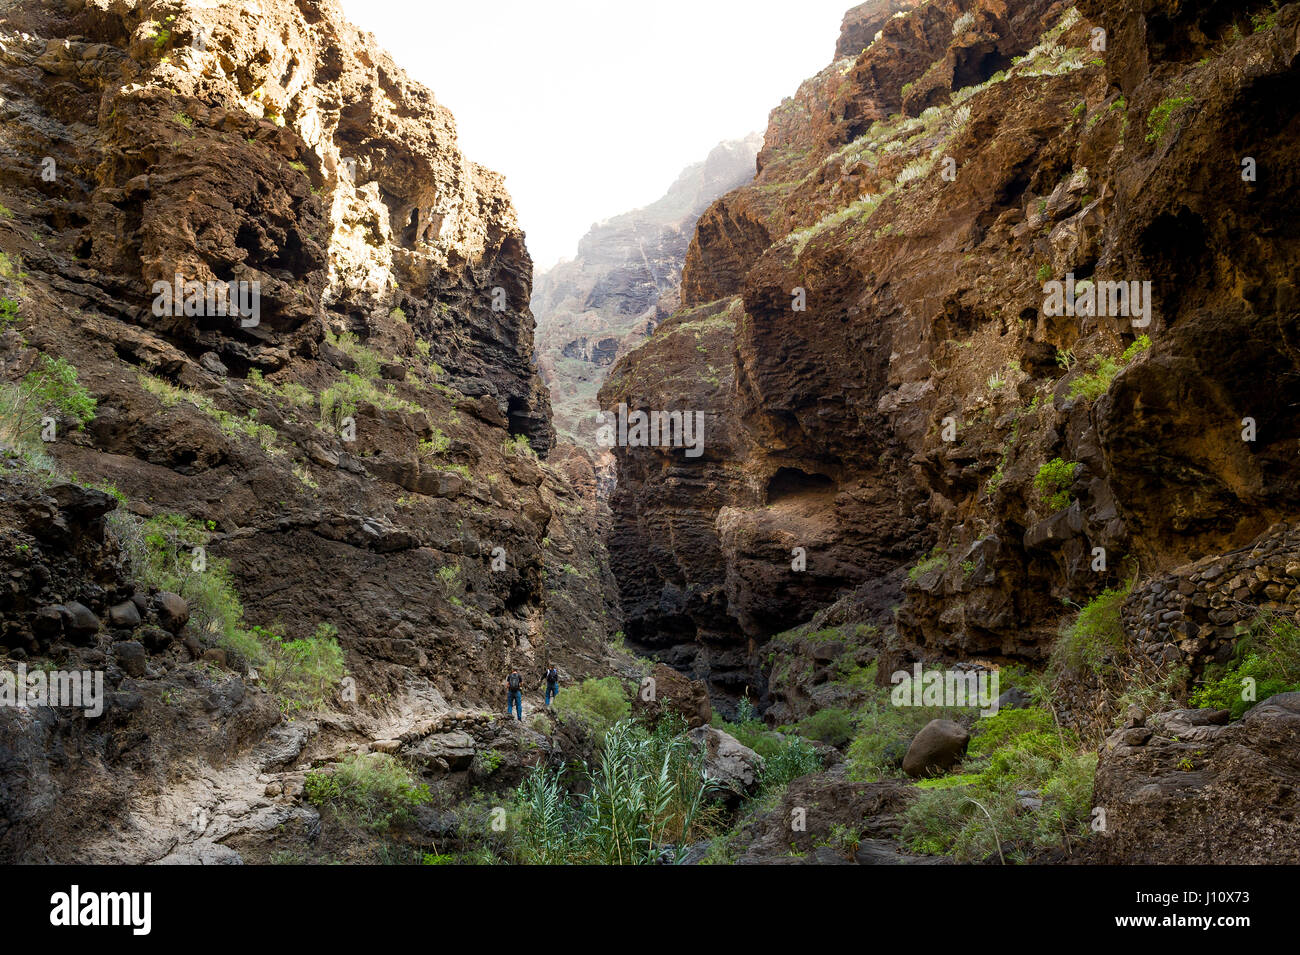 Masca trekking, Tenerife - Stock Image